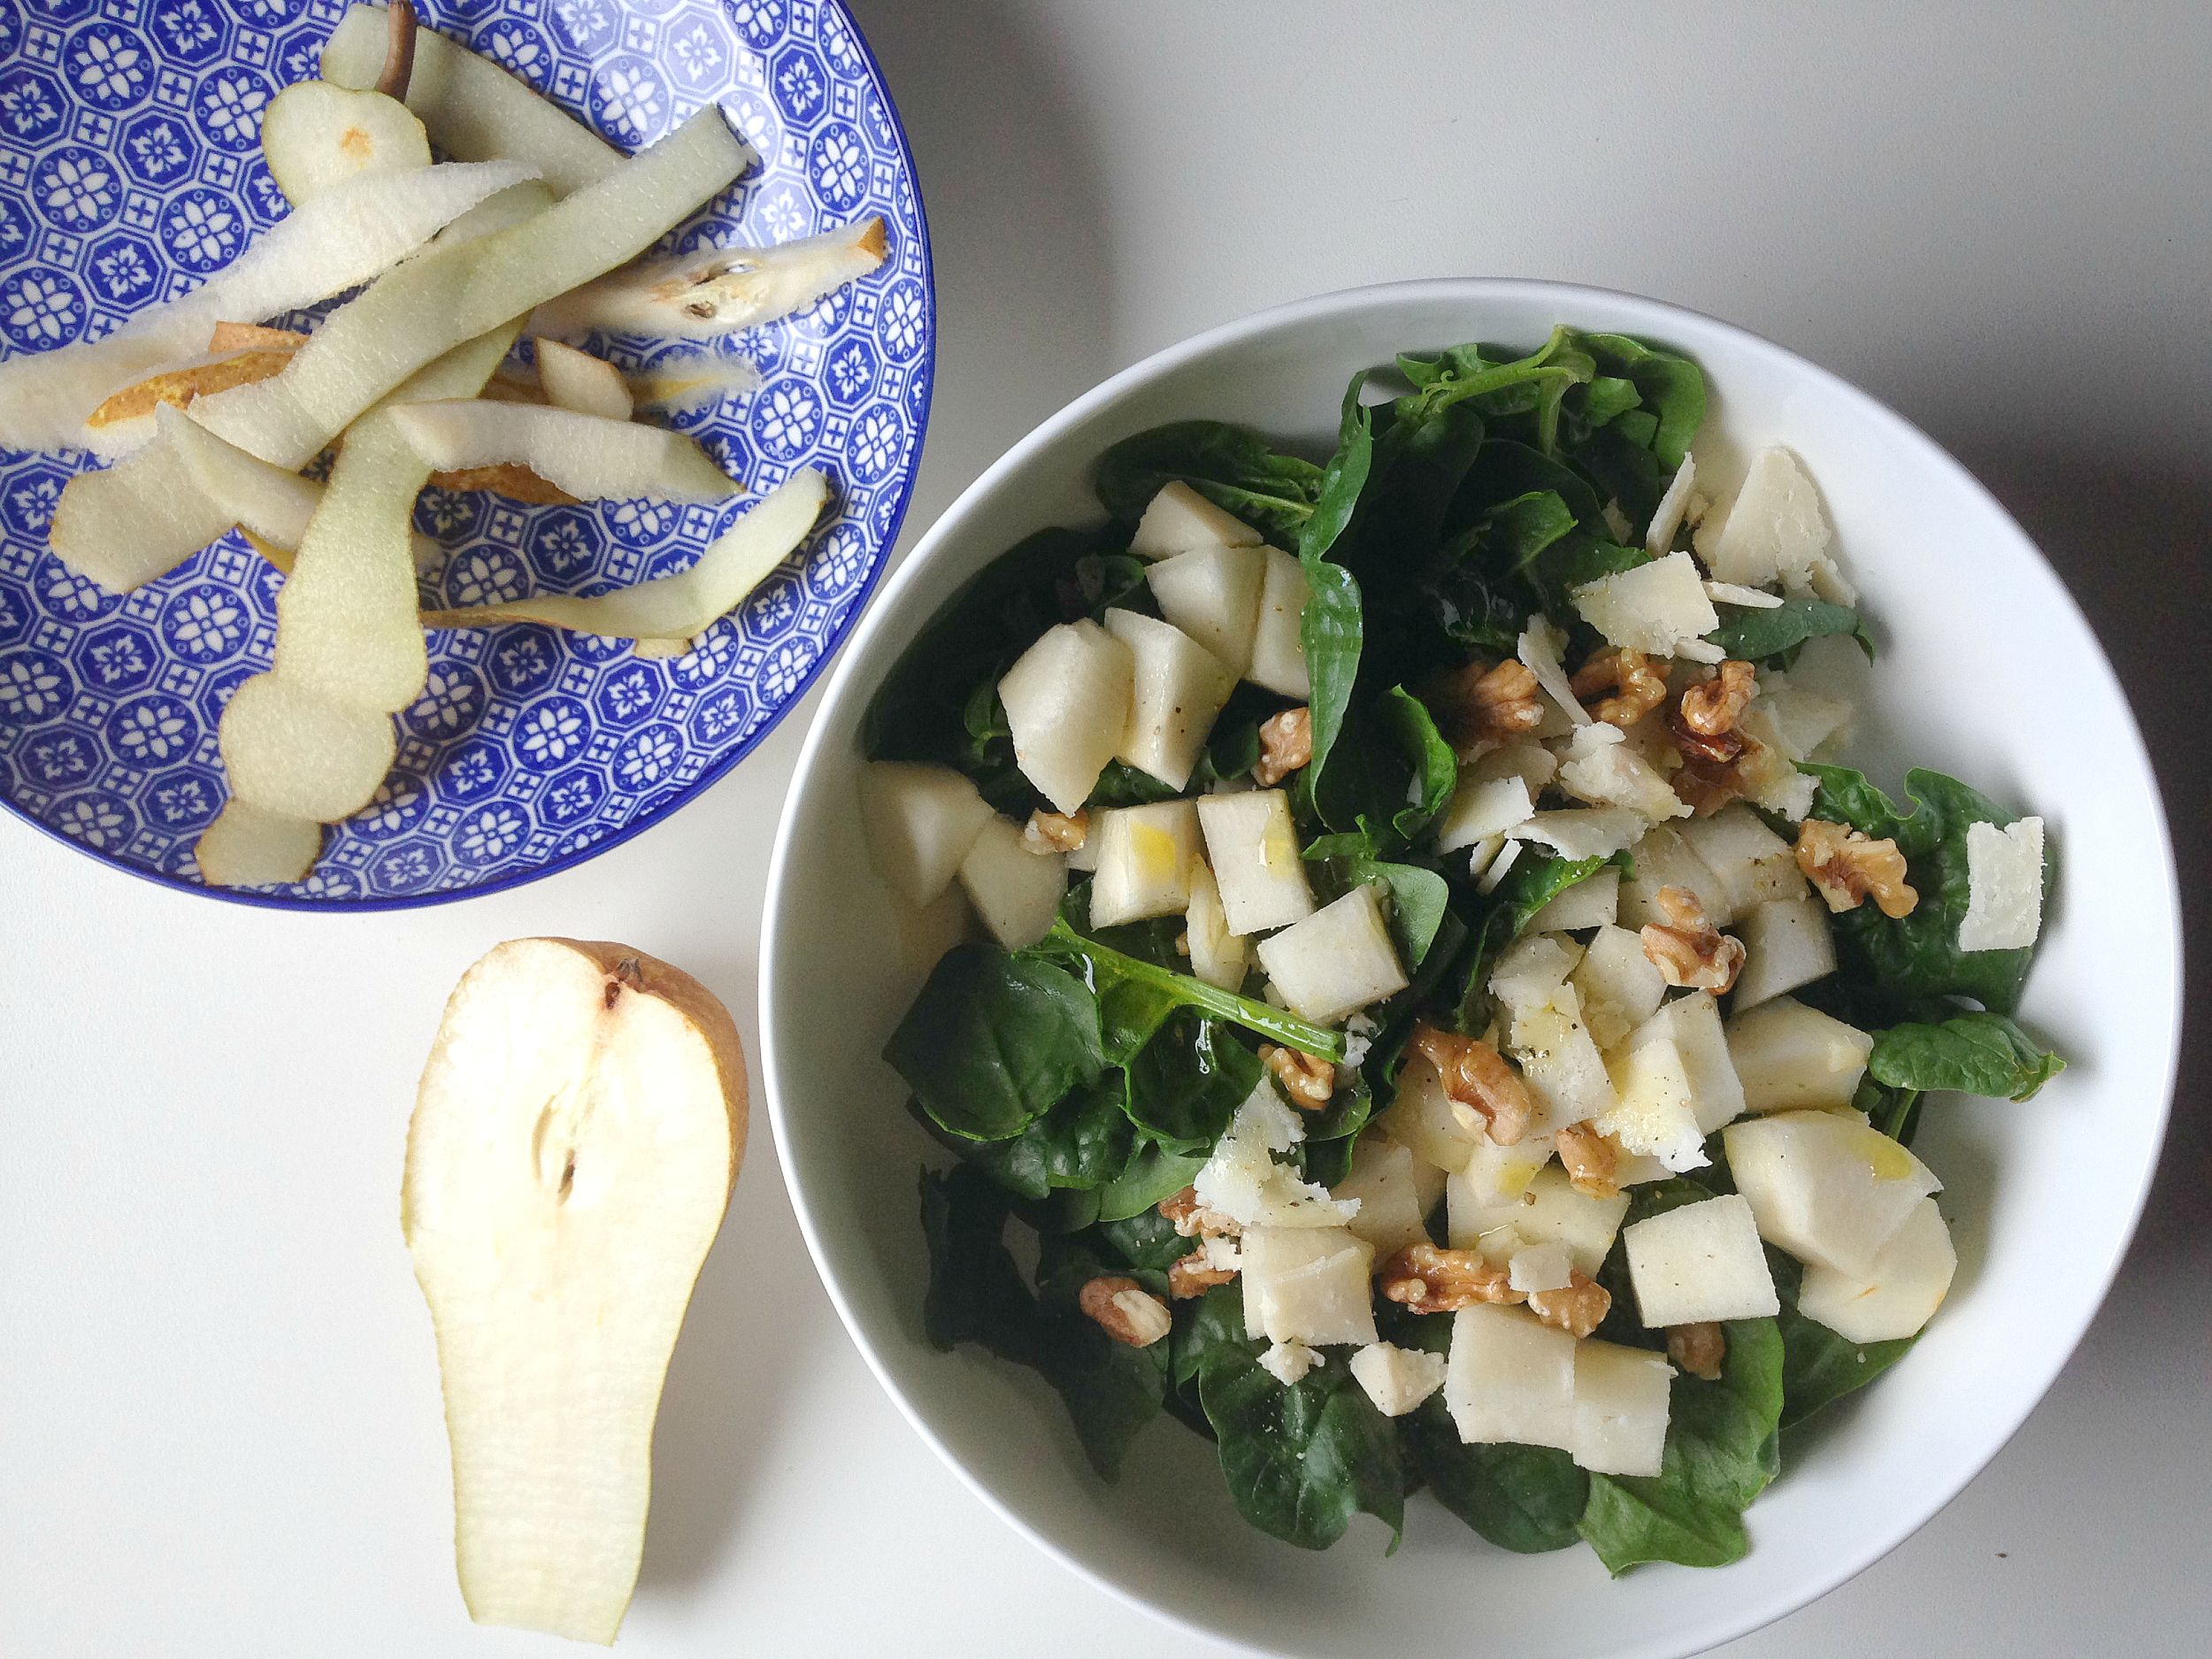 insalata di spinaci freschi cookthelook